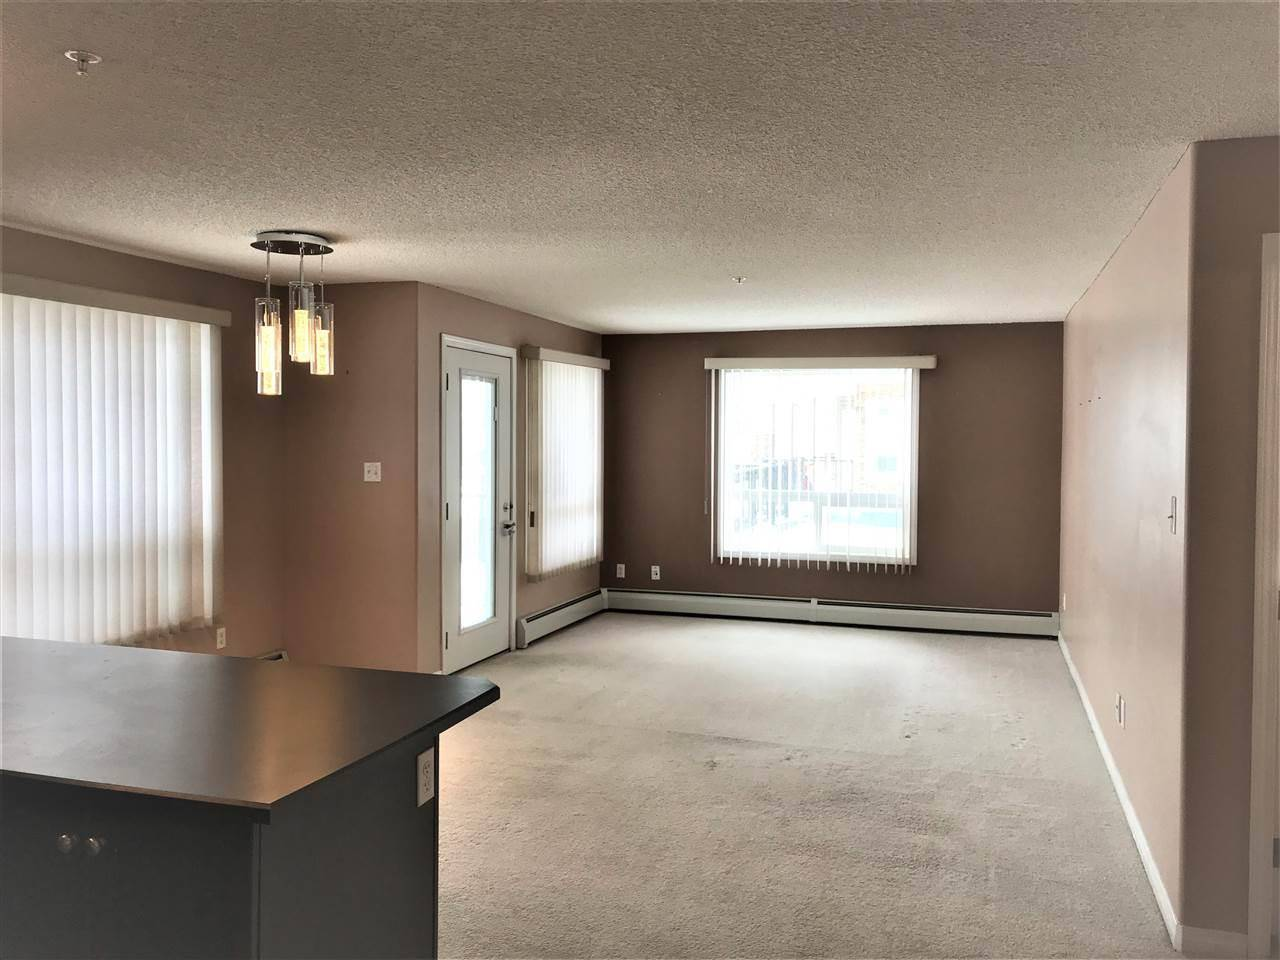 Condo for sale at 7339 South Terwillegar Dr Nw Unit 1105 Edmonton Alberta - MLS: E4189621